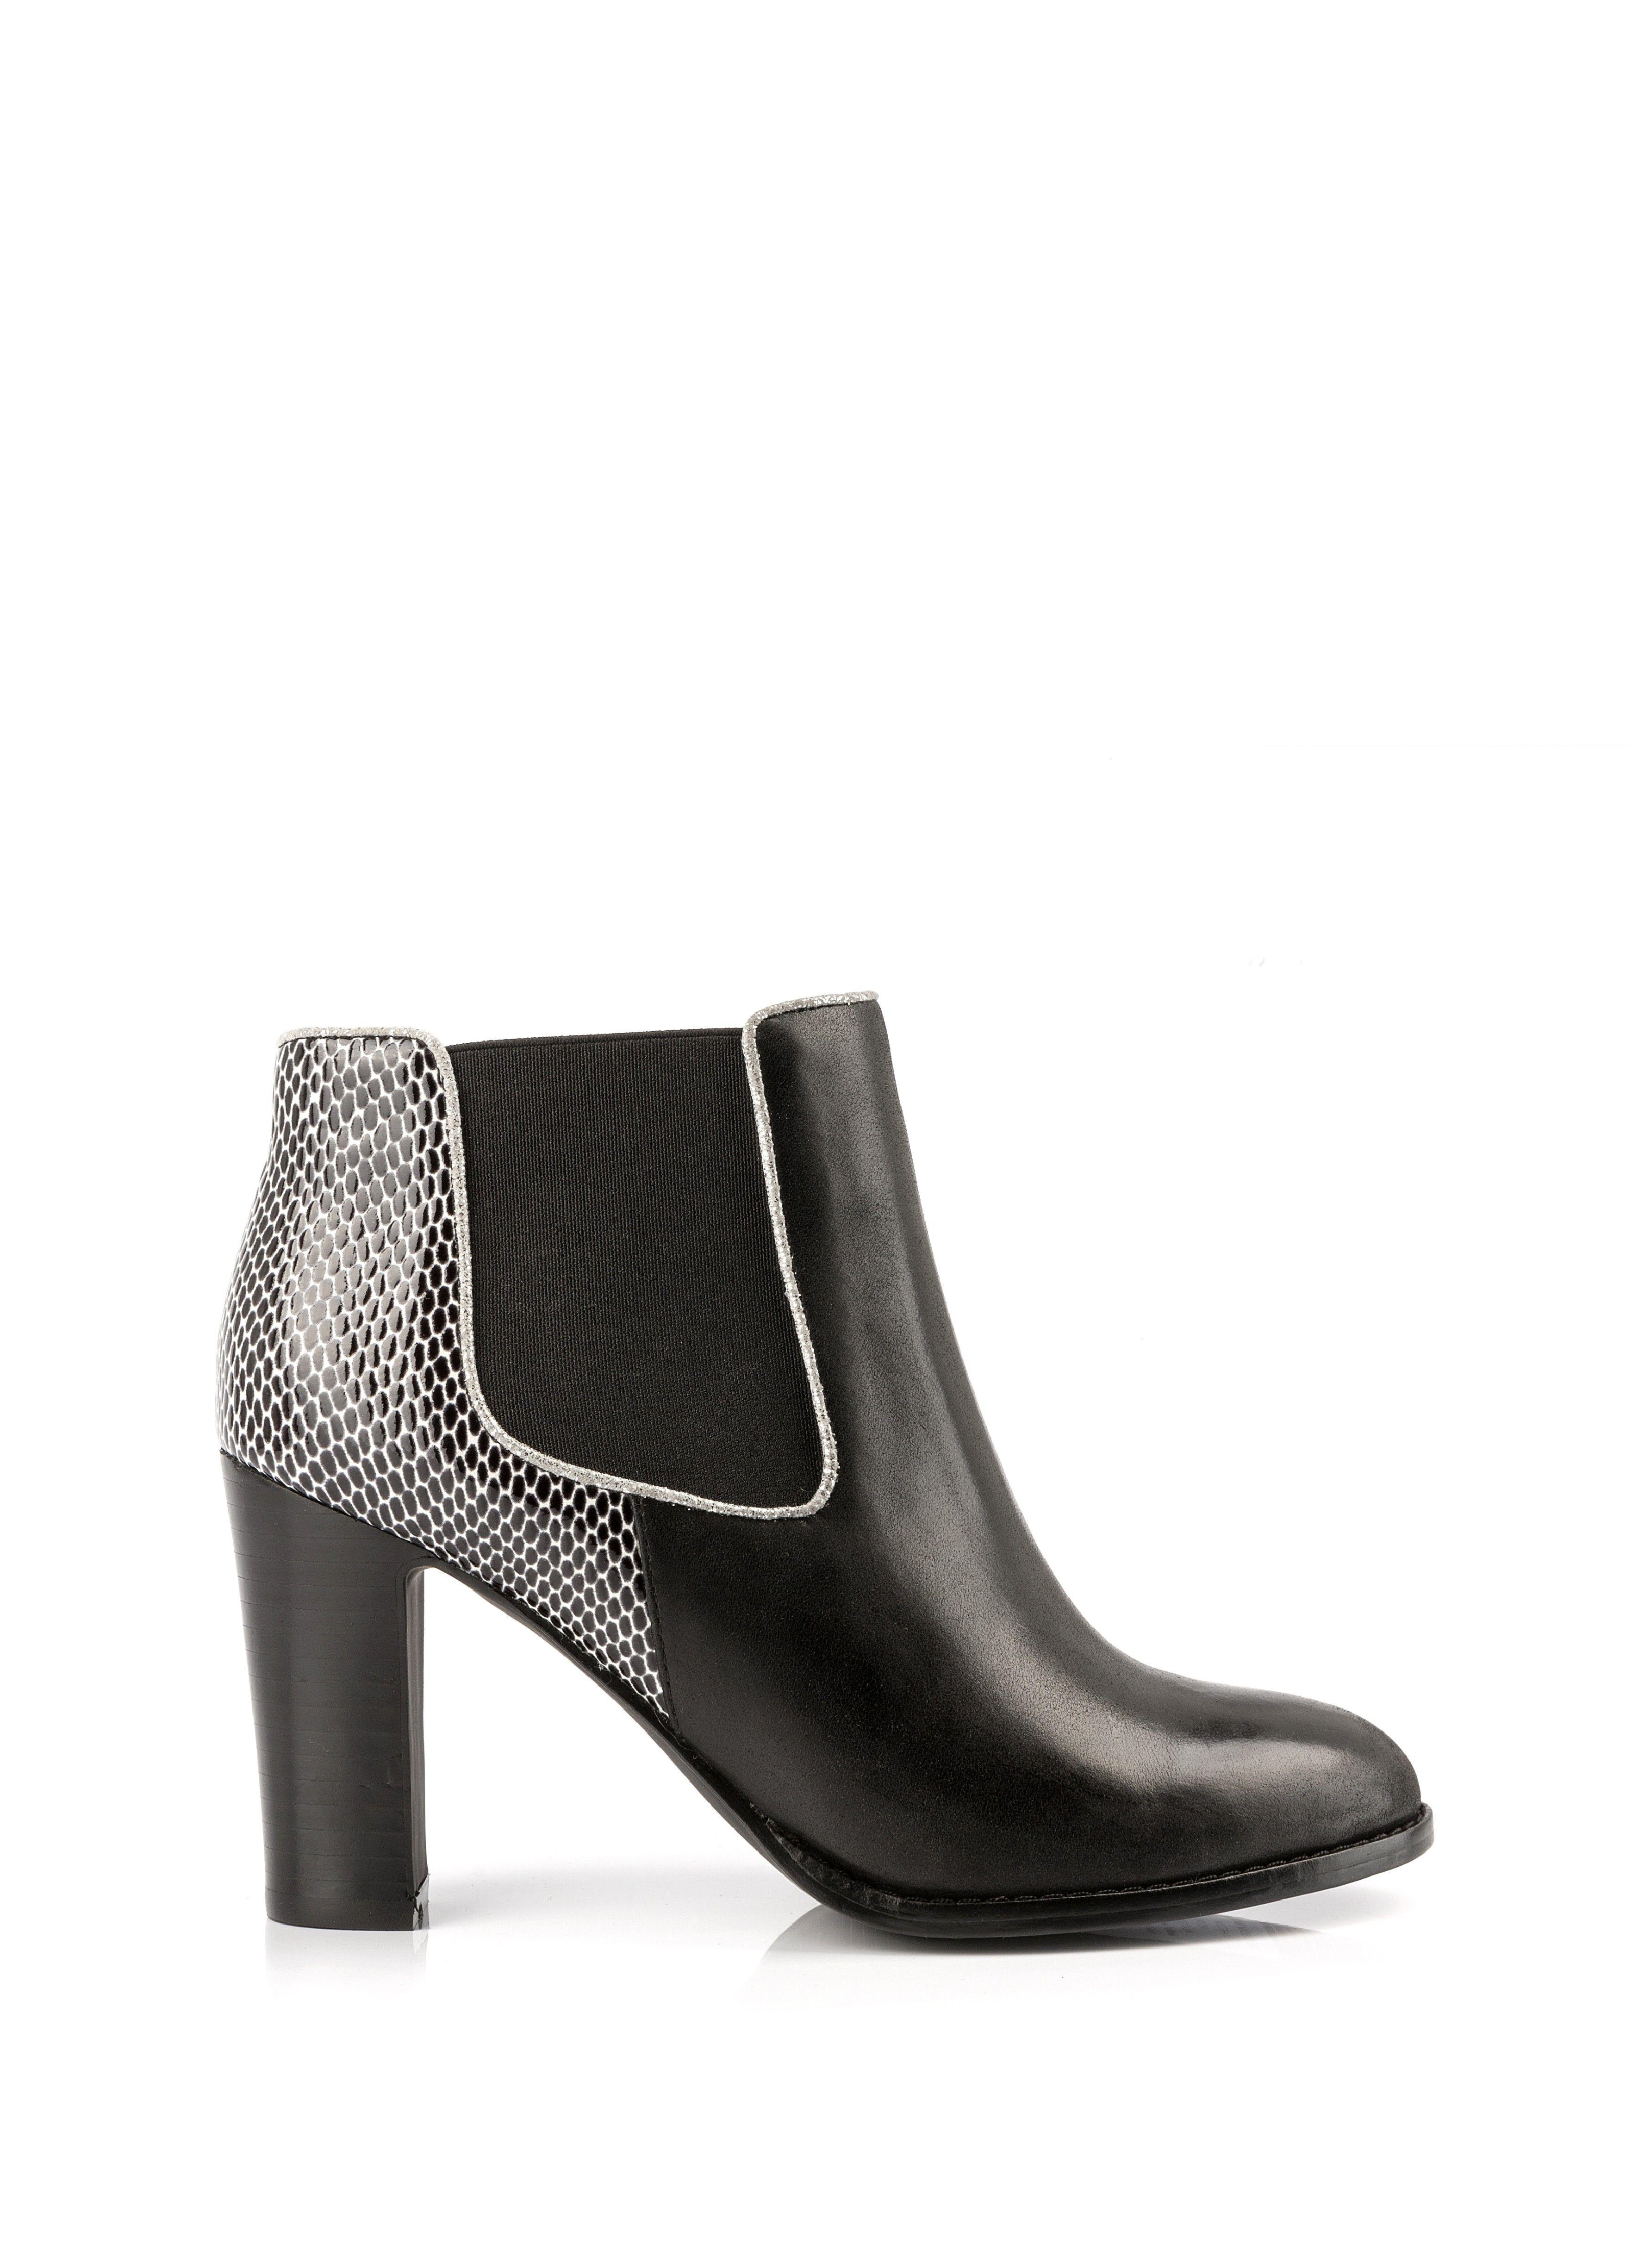 bottine à talon tazia noir - chaussures femme - femme mellow